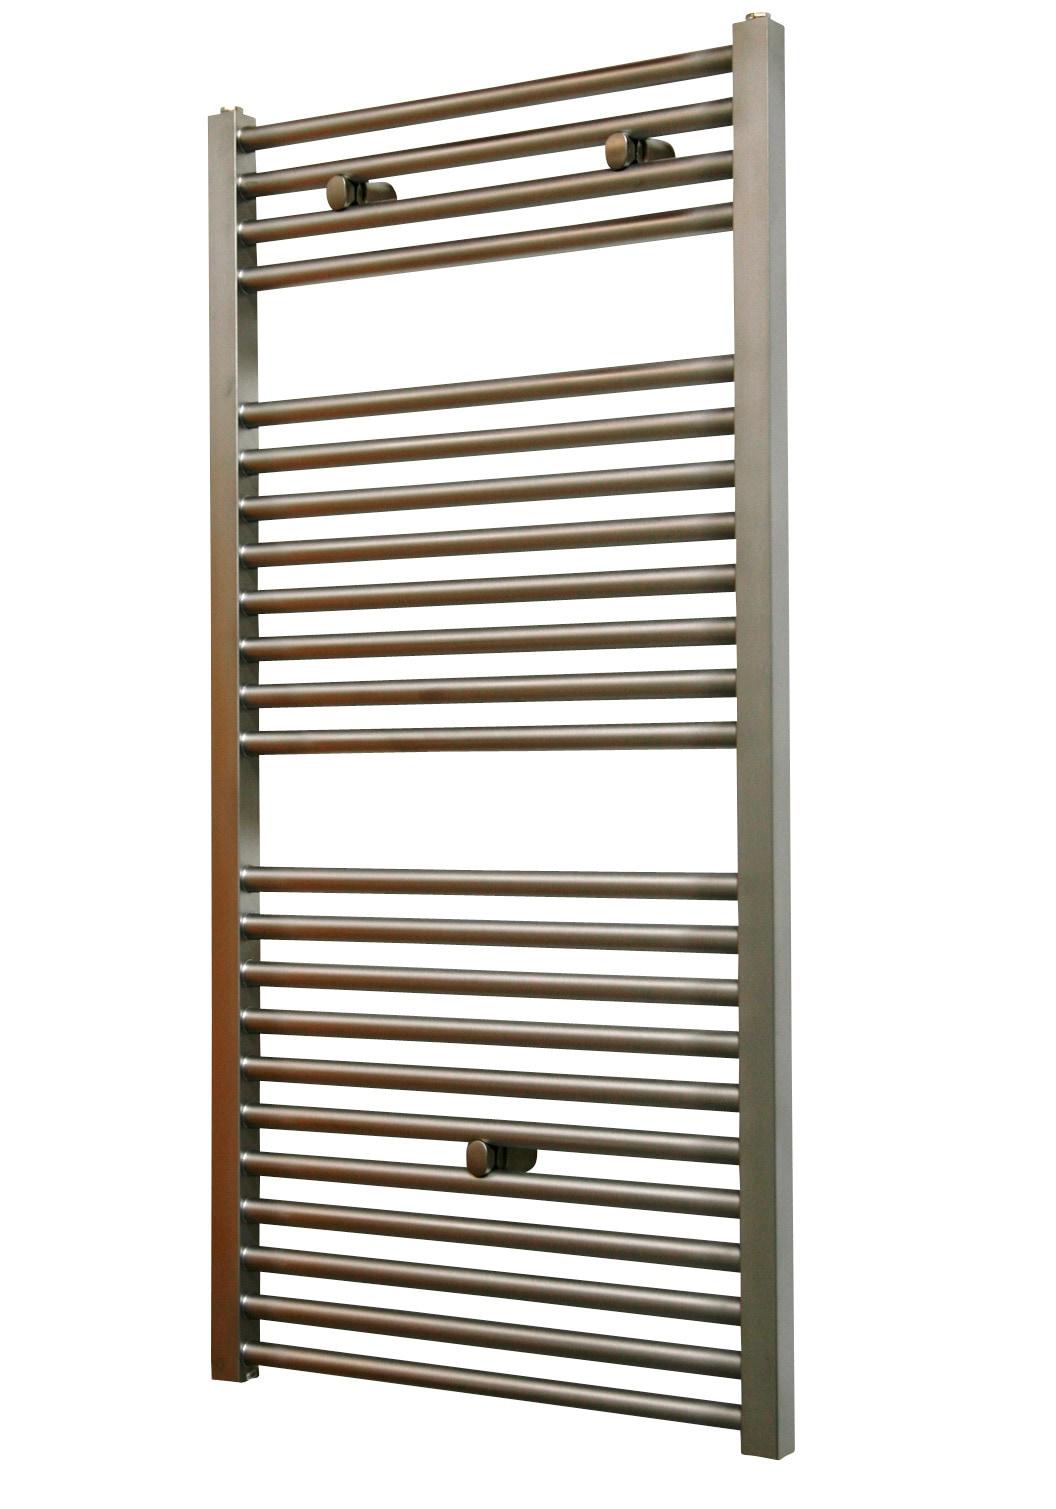 Sz Metall Edelstahl-Badheizkörper | Baumarkt > Heizung und Klima | SZ Metall